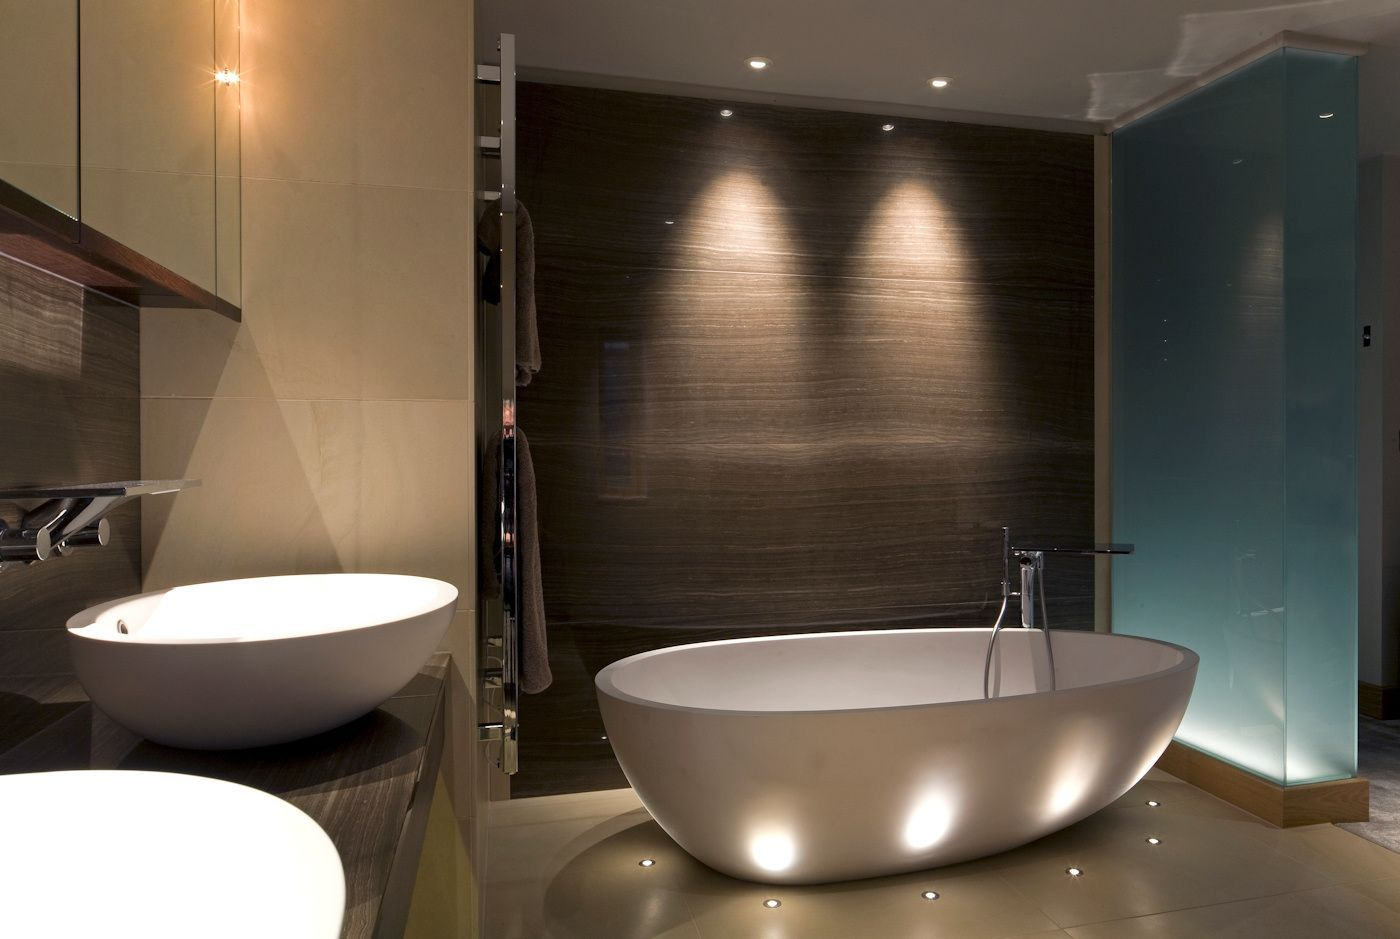 Bathroom Lighting And Modern Bathroom Light Fixtures Also Freestanding Soaking Tub Plus Bathroom Sink B Sleek Bathroom Bathroom Recessed Lighting Small Remodel